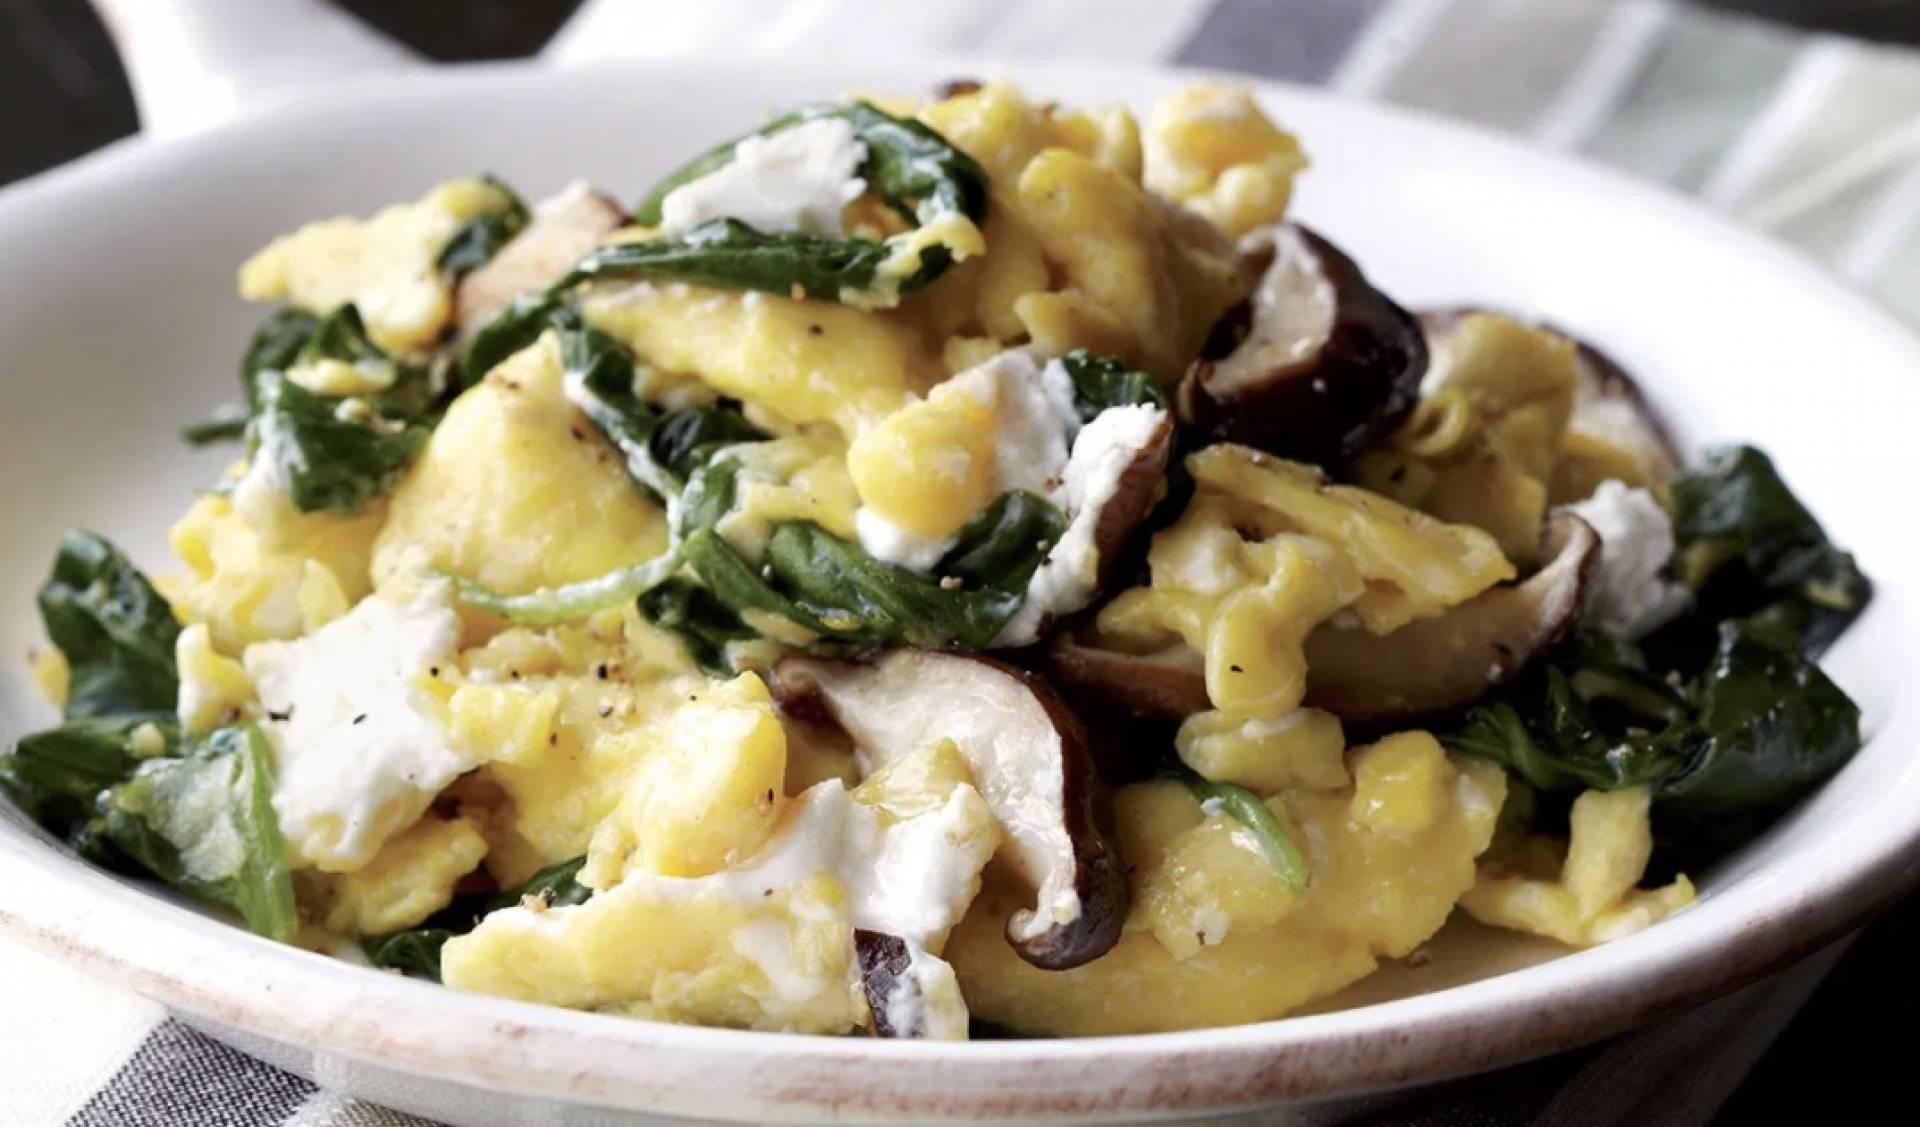 Mushroom and Swiss Egg Scramble